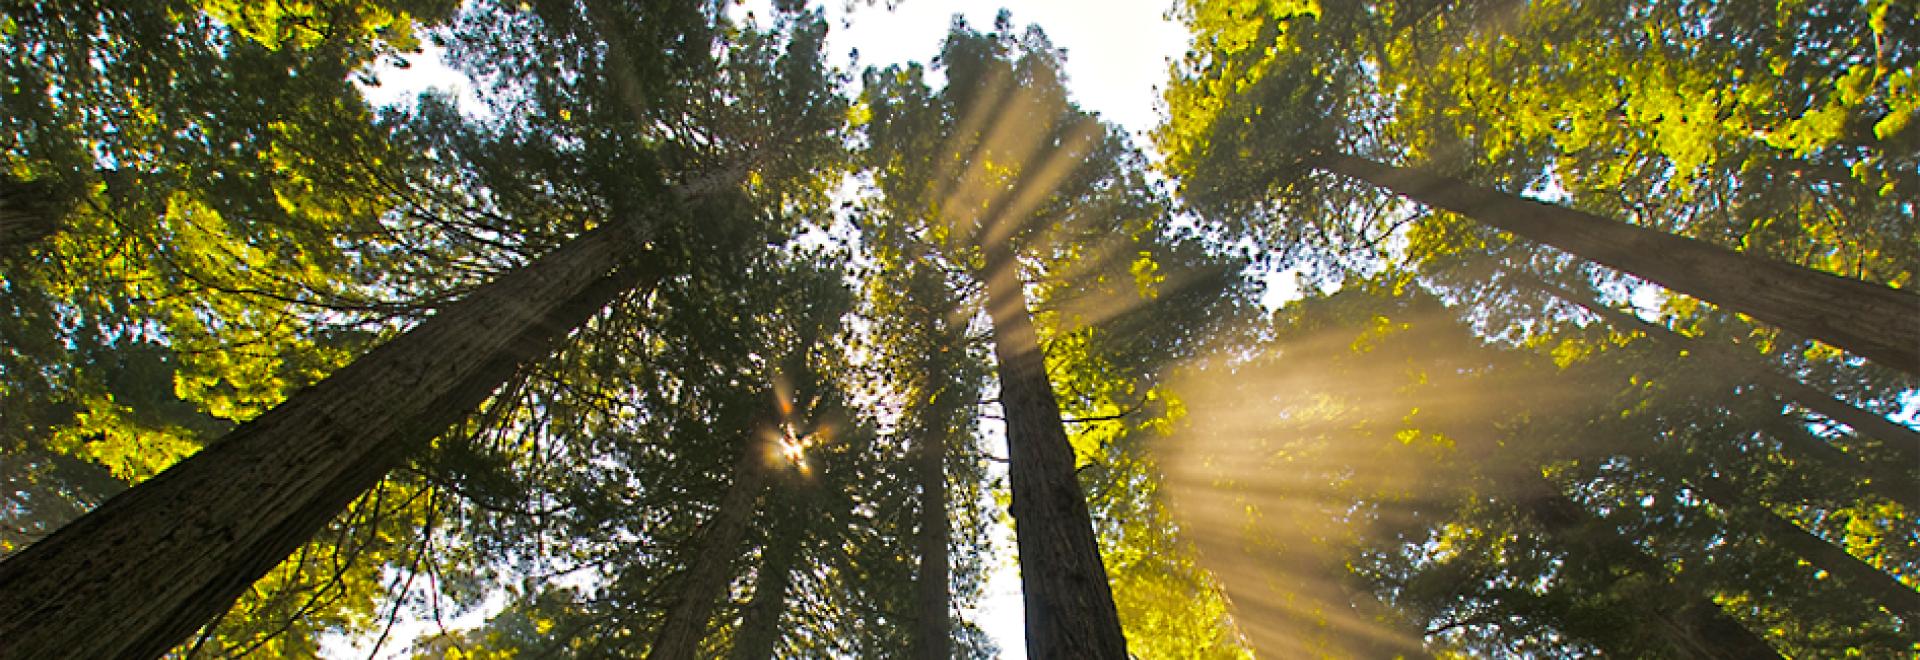 Sunlight filtering through the Redwoods